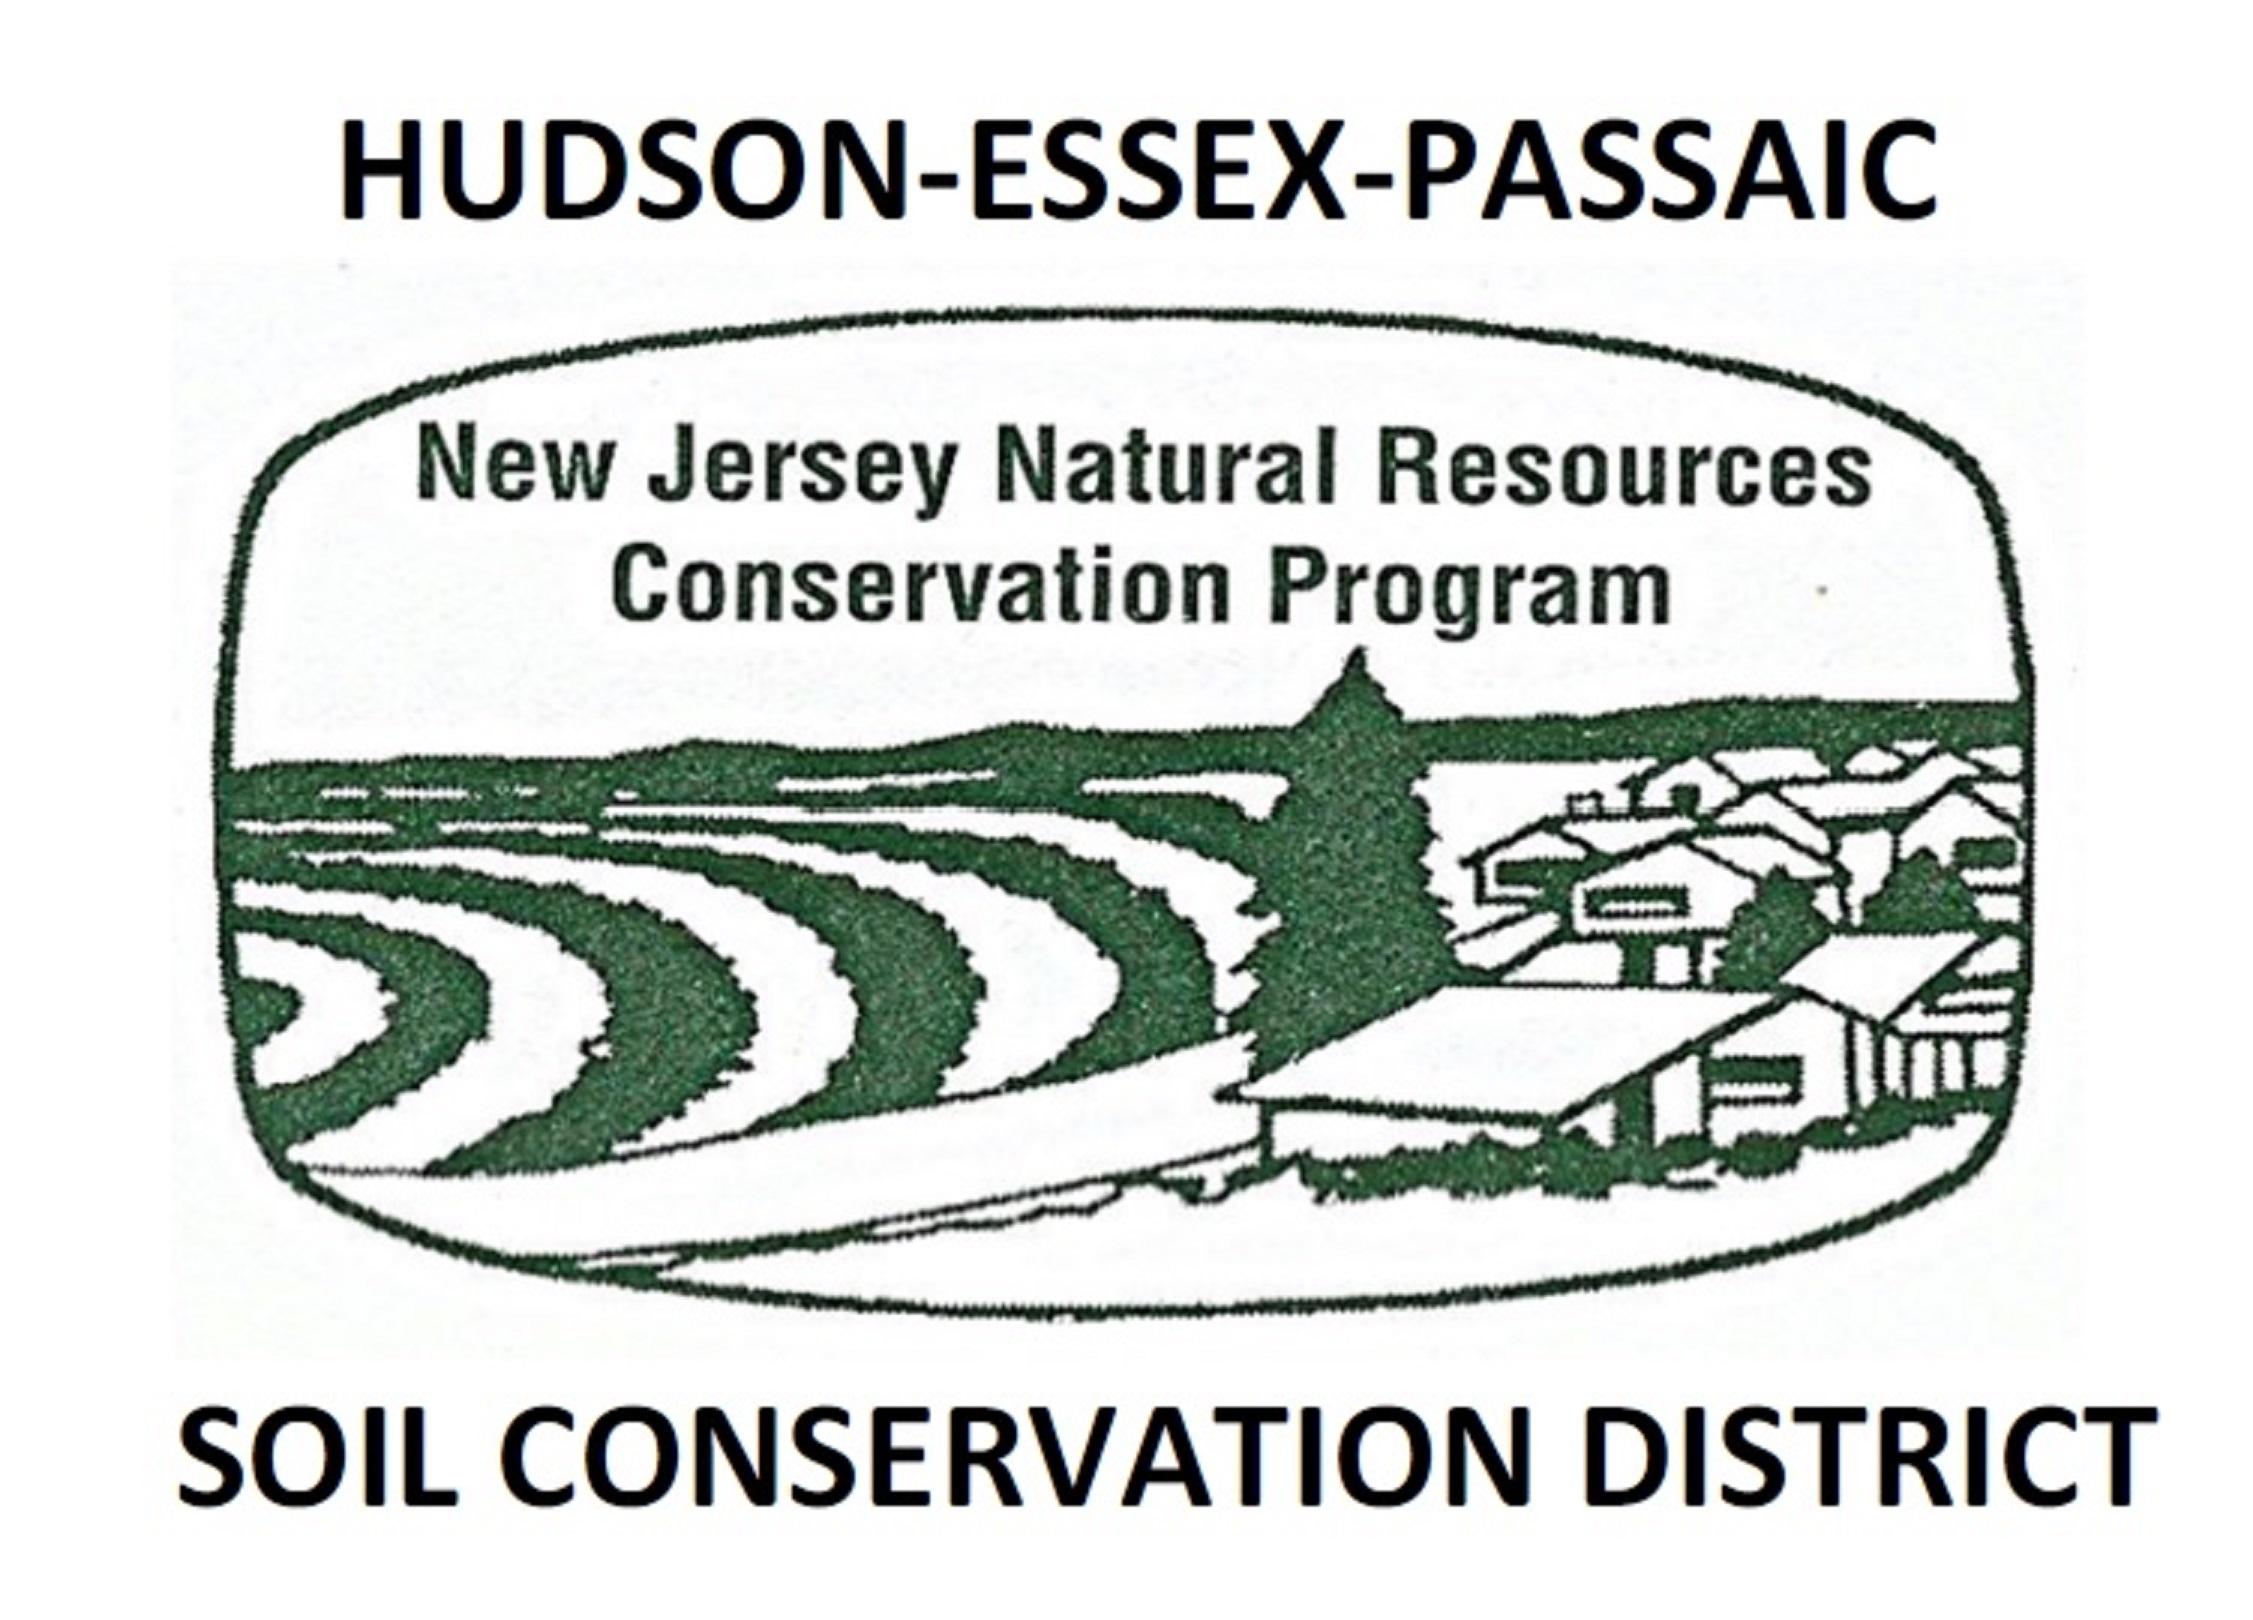 FAQ - Hudson Essex Passaic Soil Conservation District